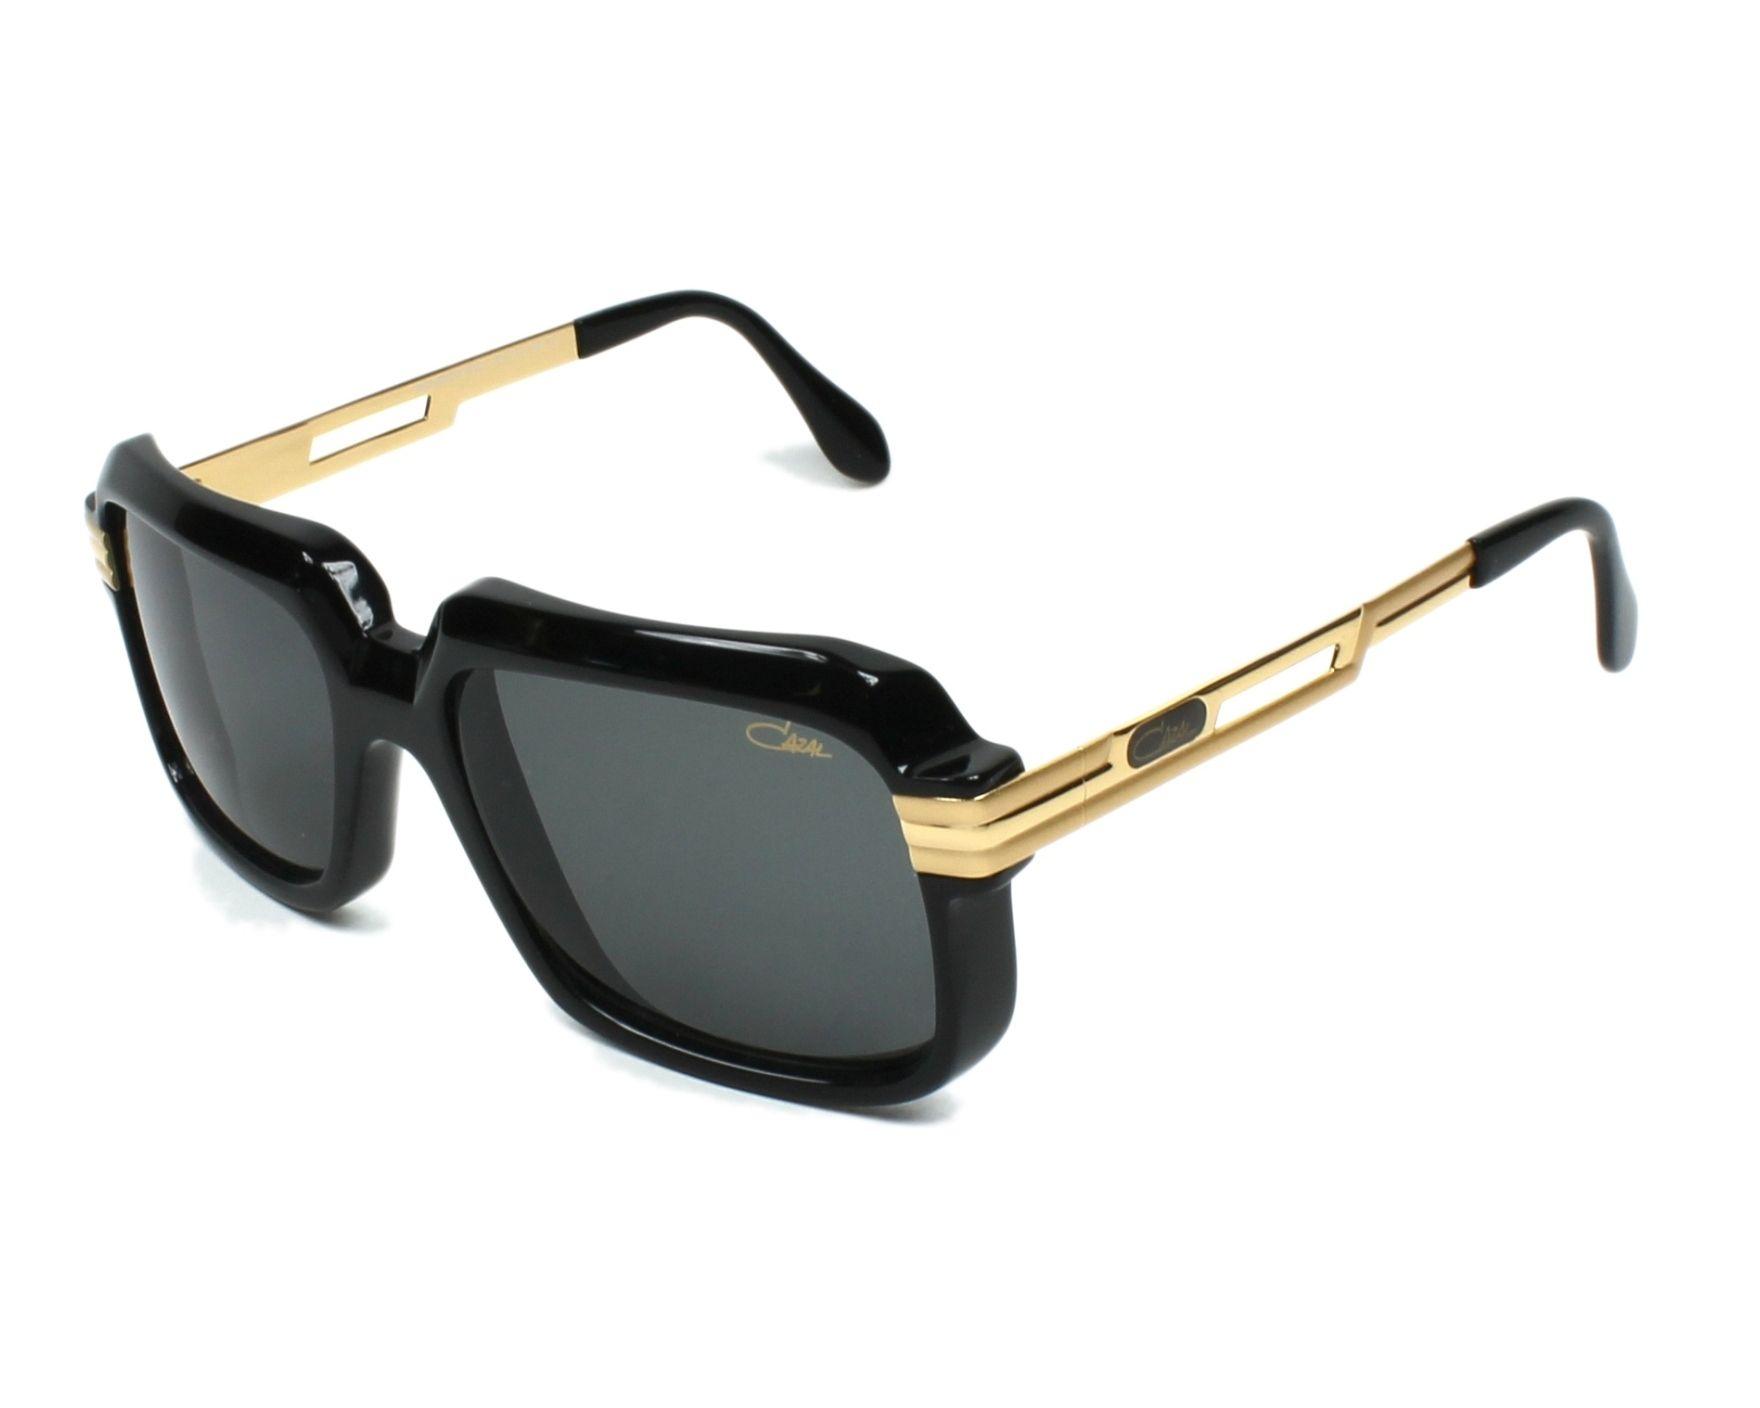 8afb57f9a6fc Sunglasses Cazal 607-2-3 001 - Black Gold profile view